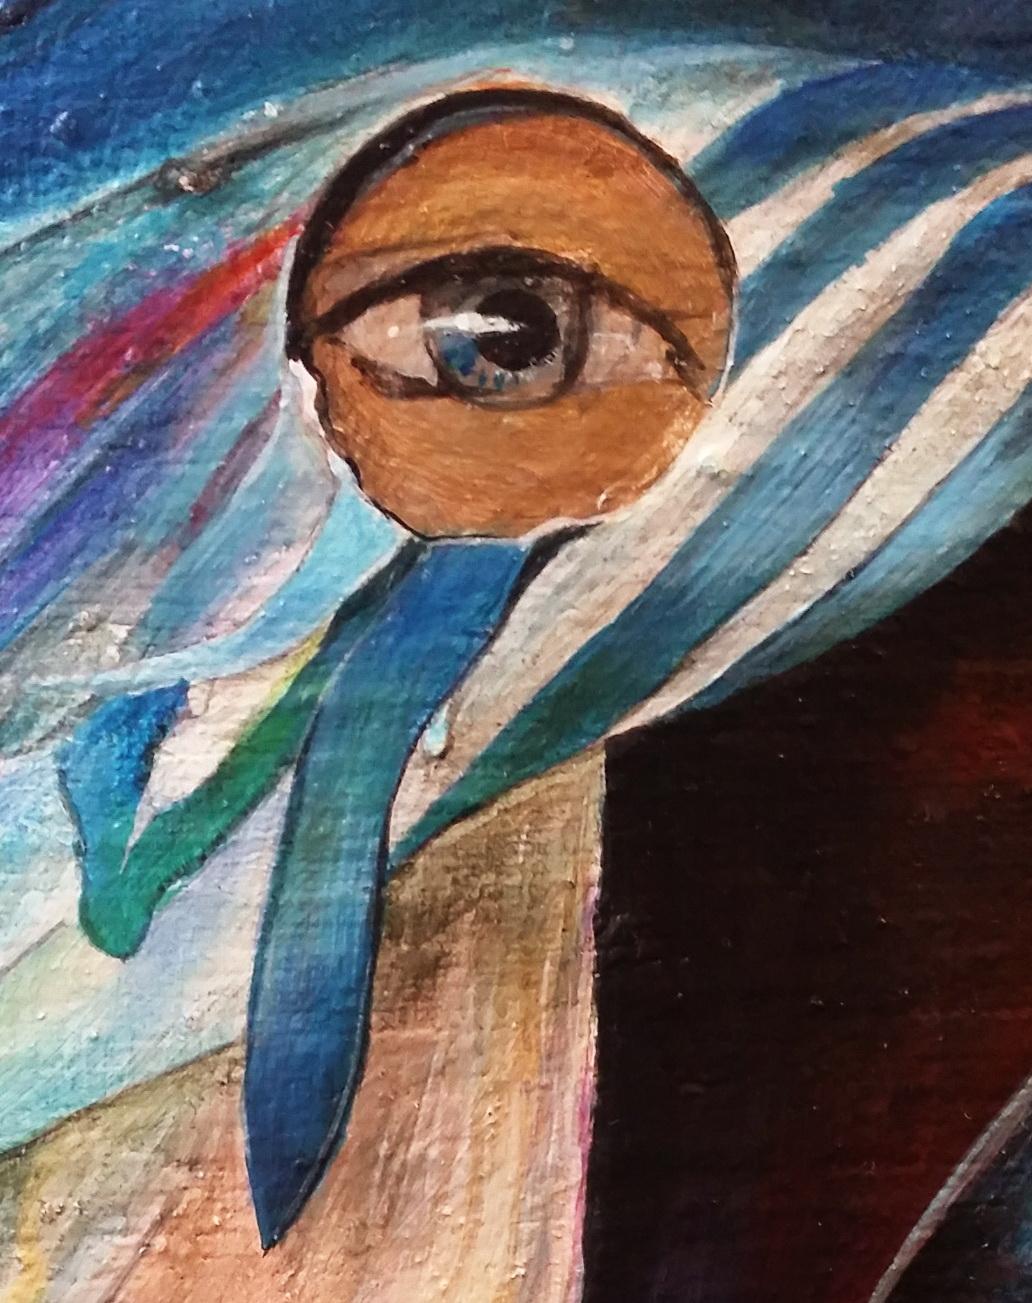 ART_paint_Im_watching_you_02